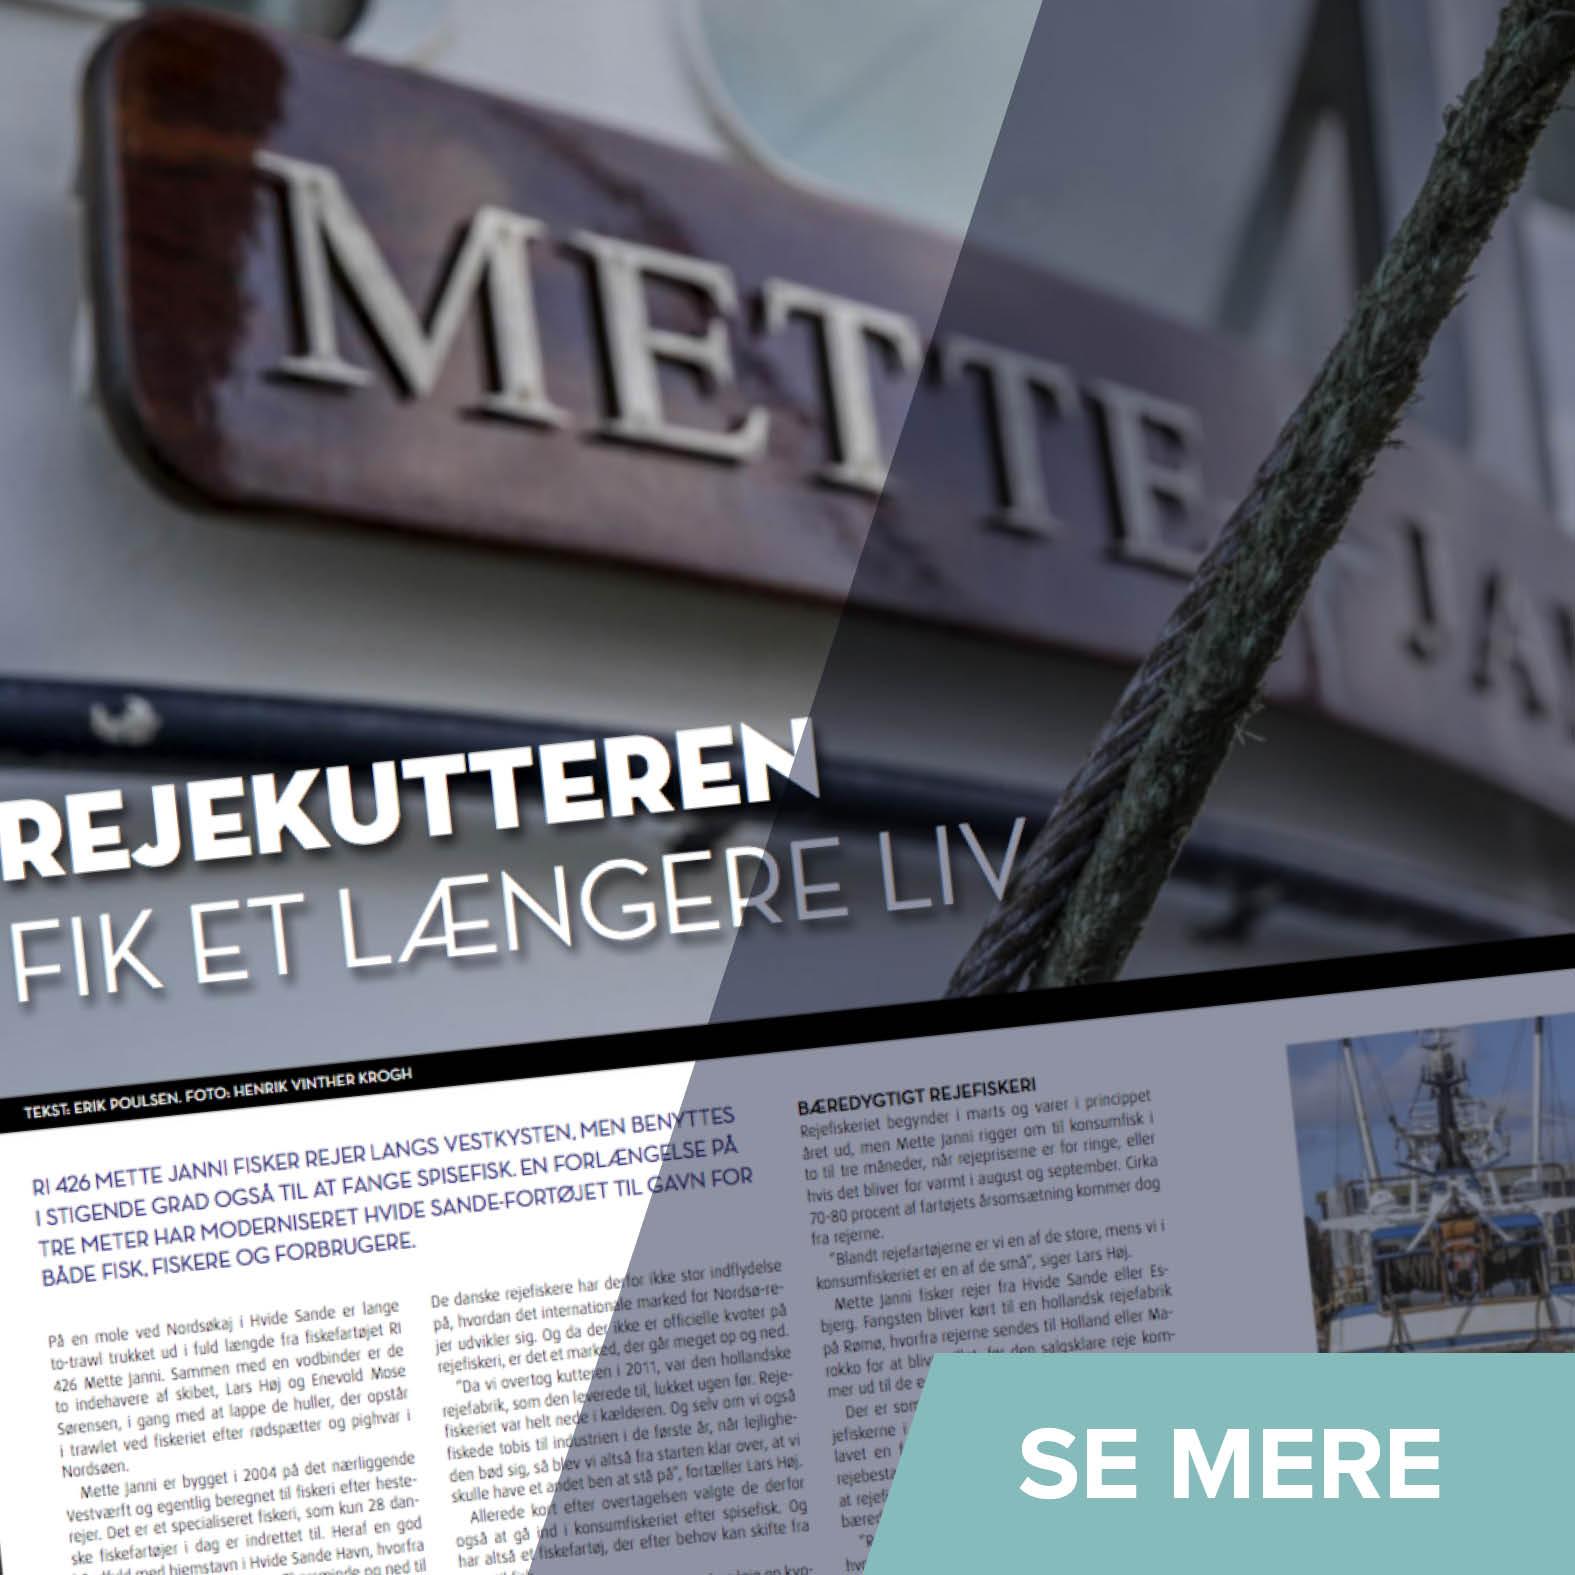 RI426 Mette Janni - Historie